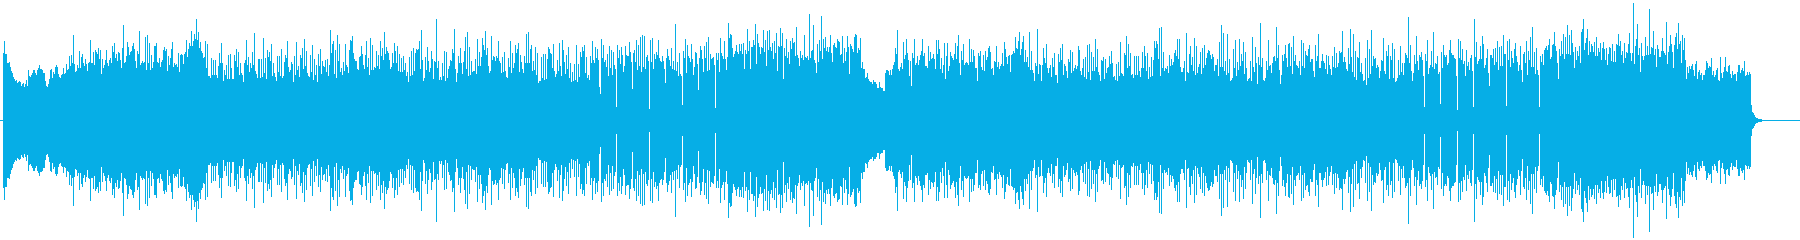 「HR/HM」「DARK」BGM273の再生済みの波形